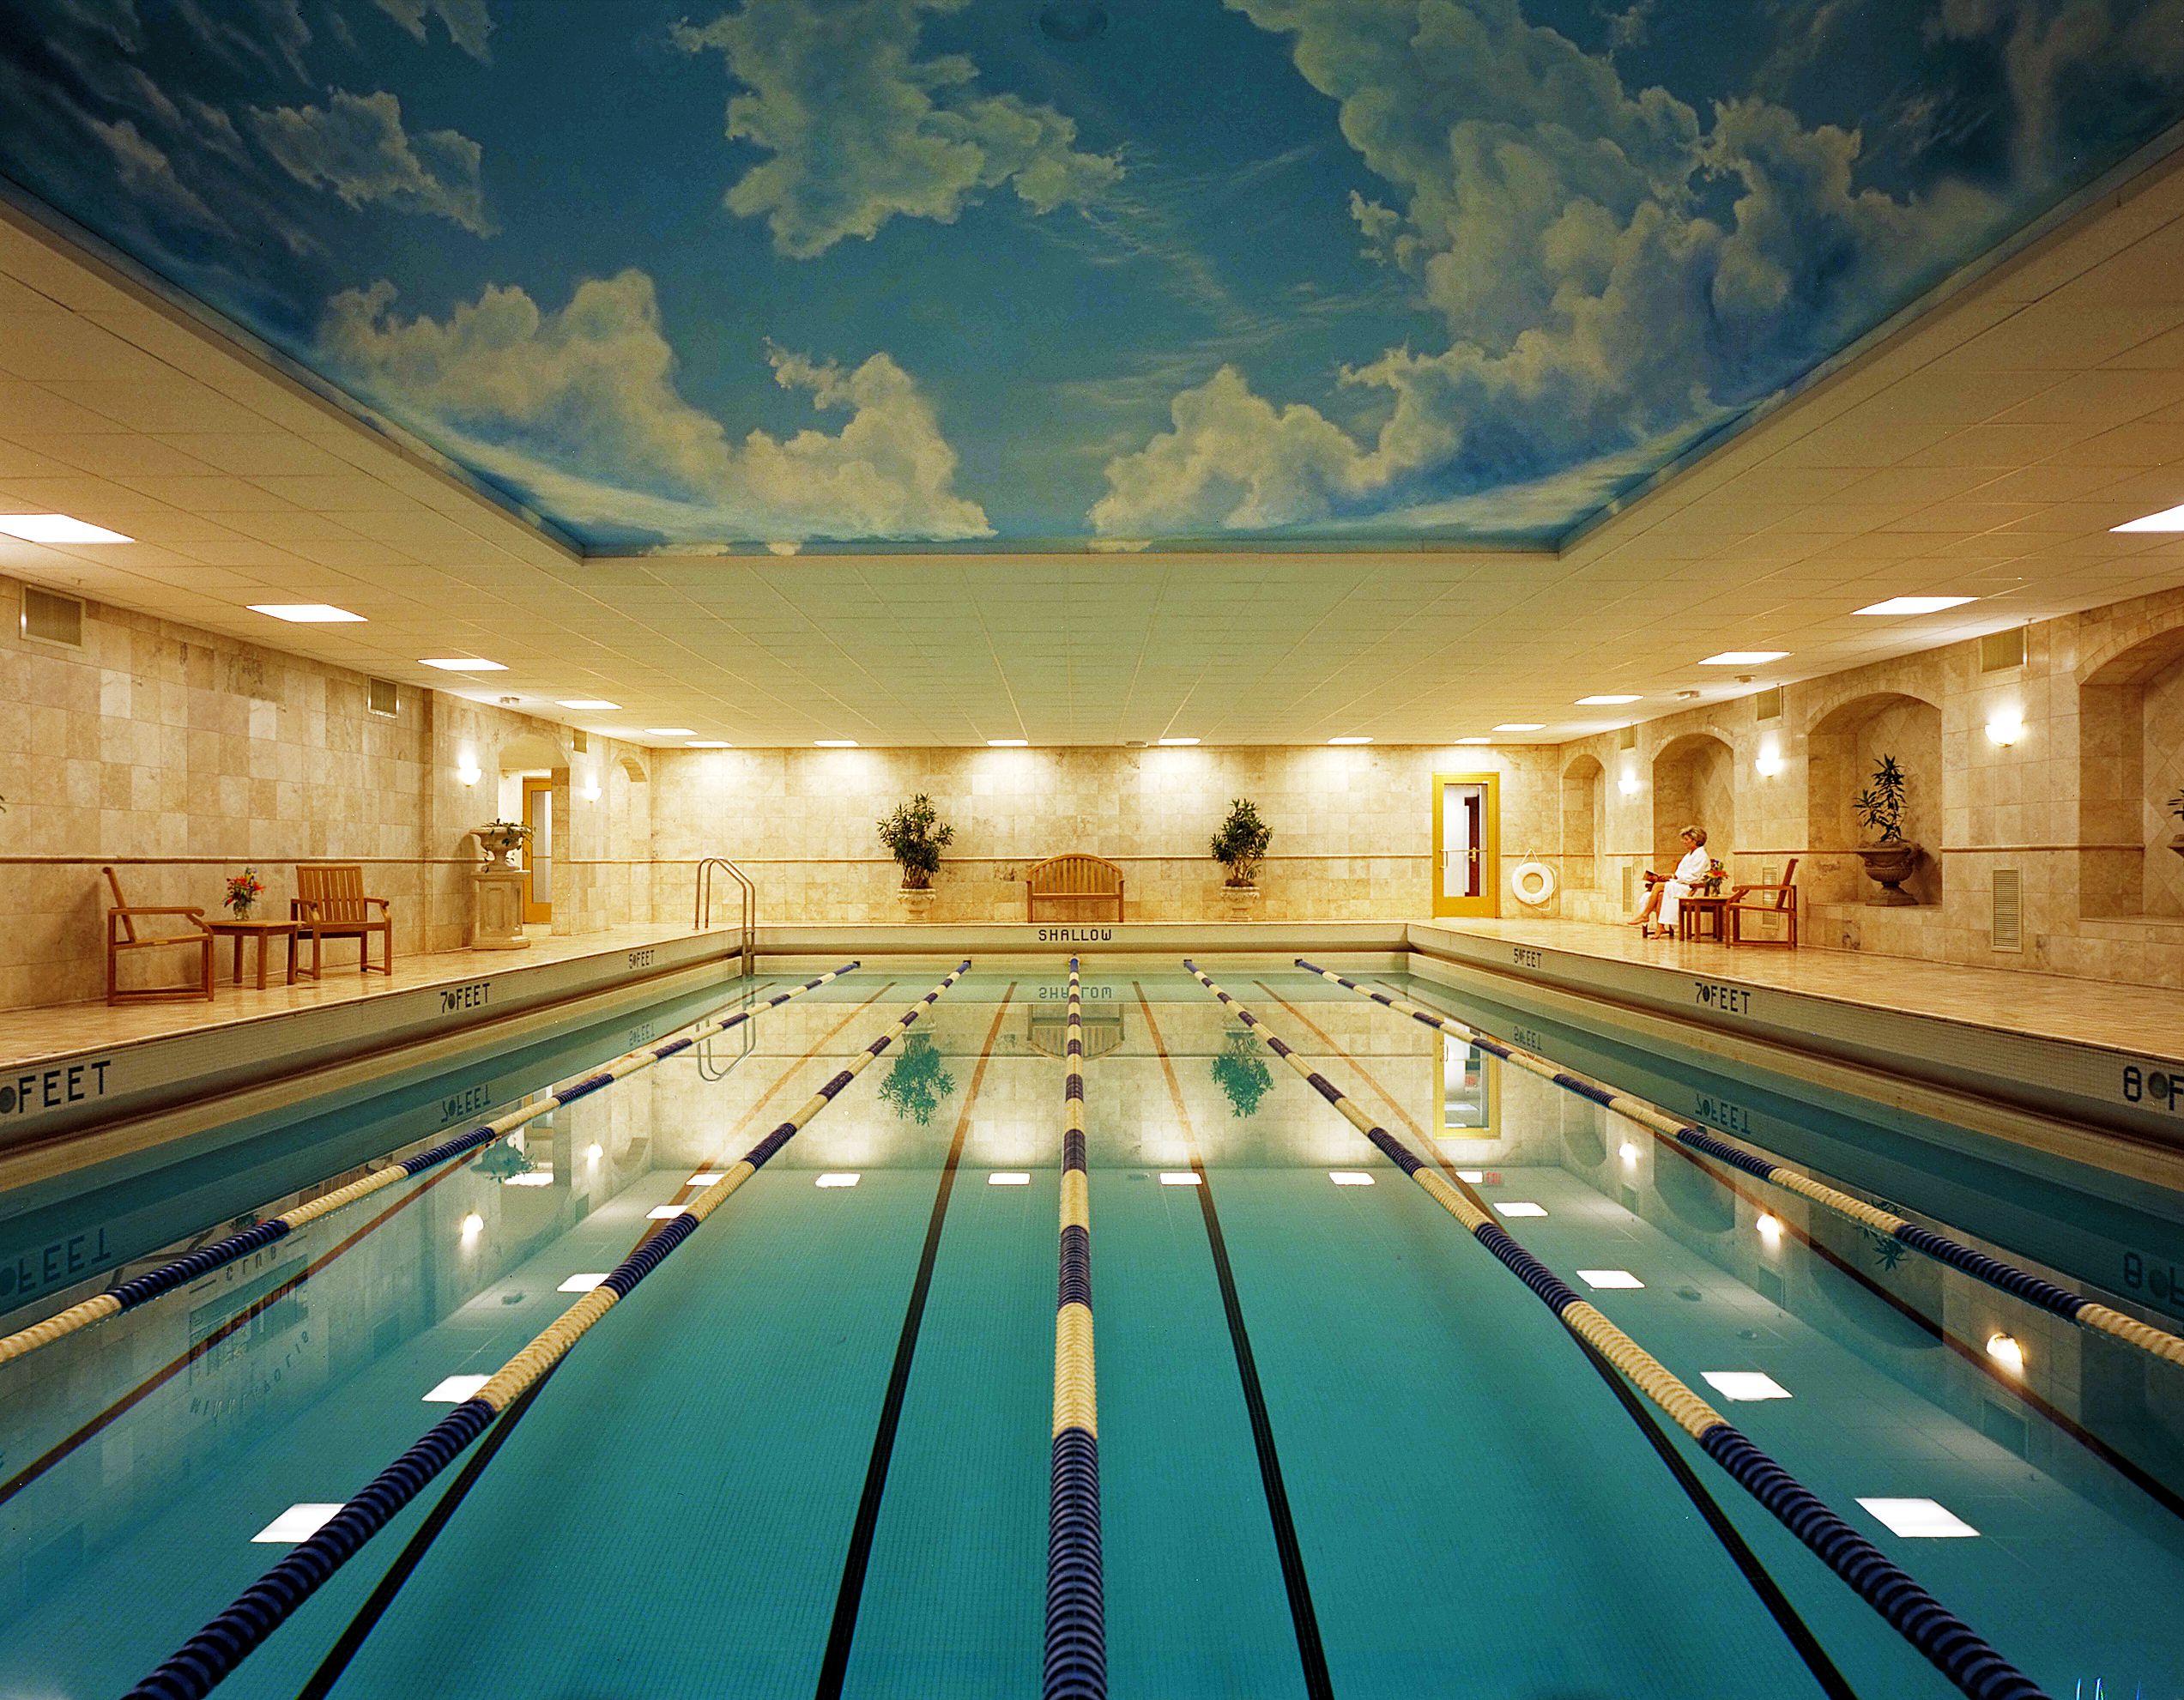 Grand Hotel Minneapolis - Lifetime Fitness Lap Pool